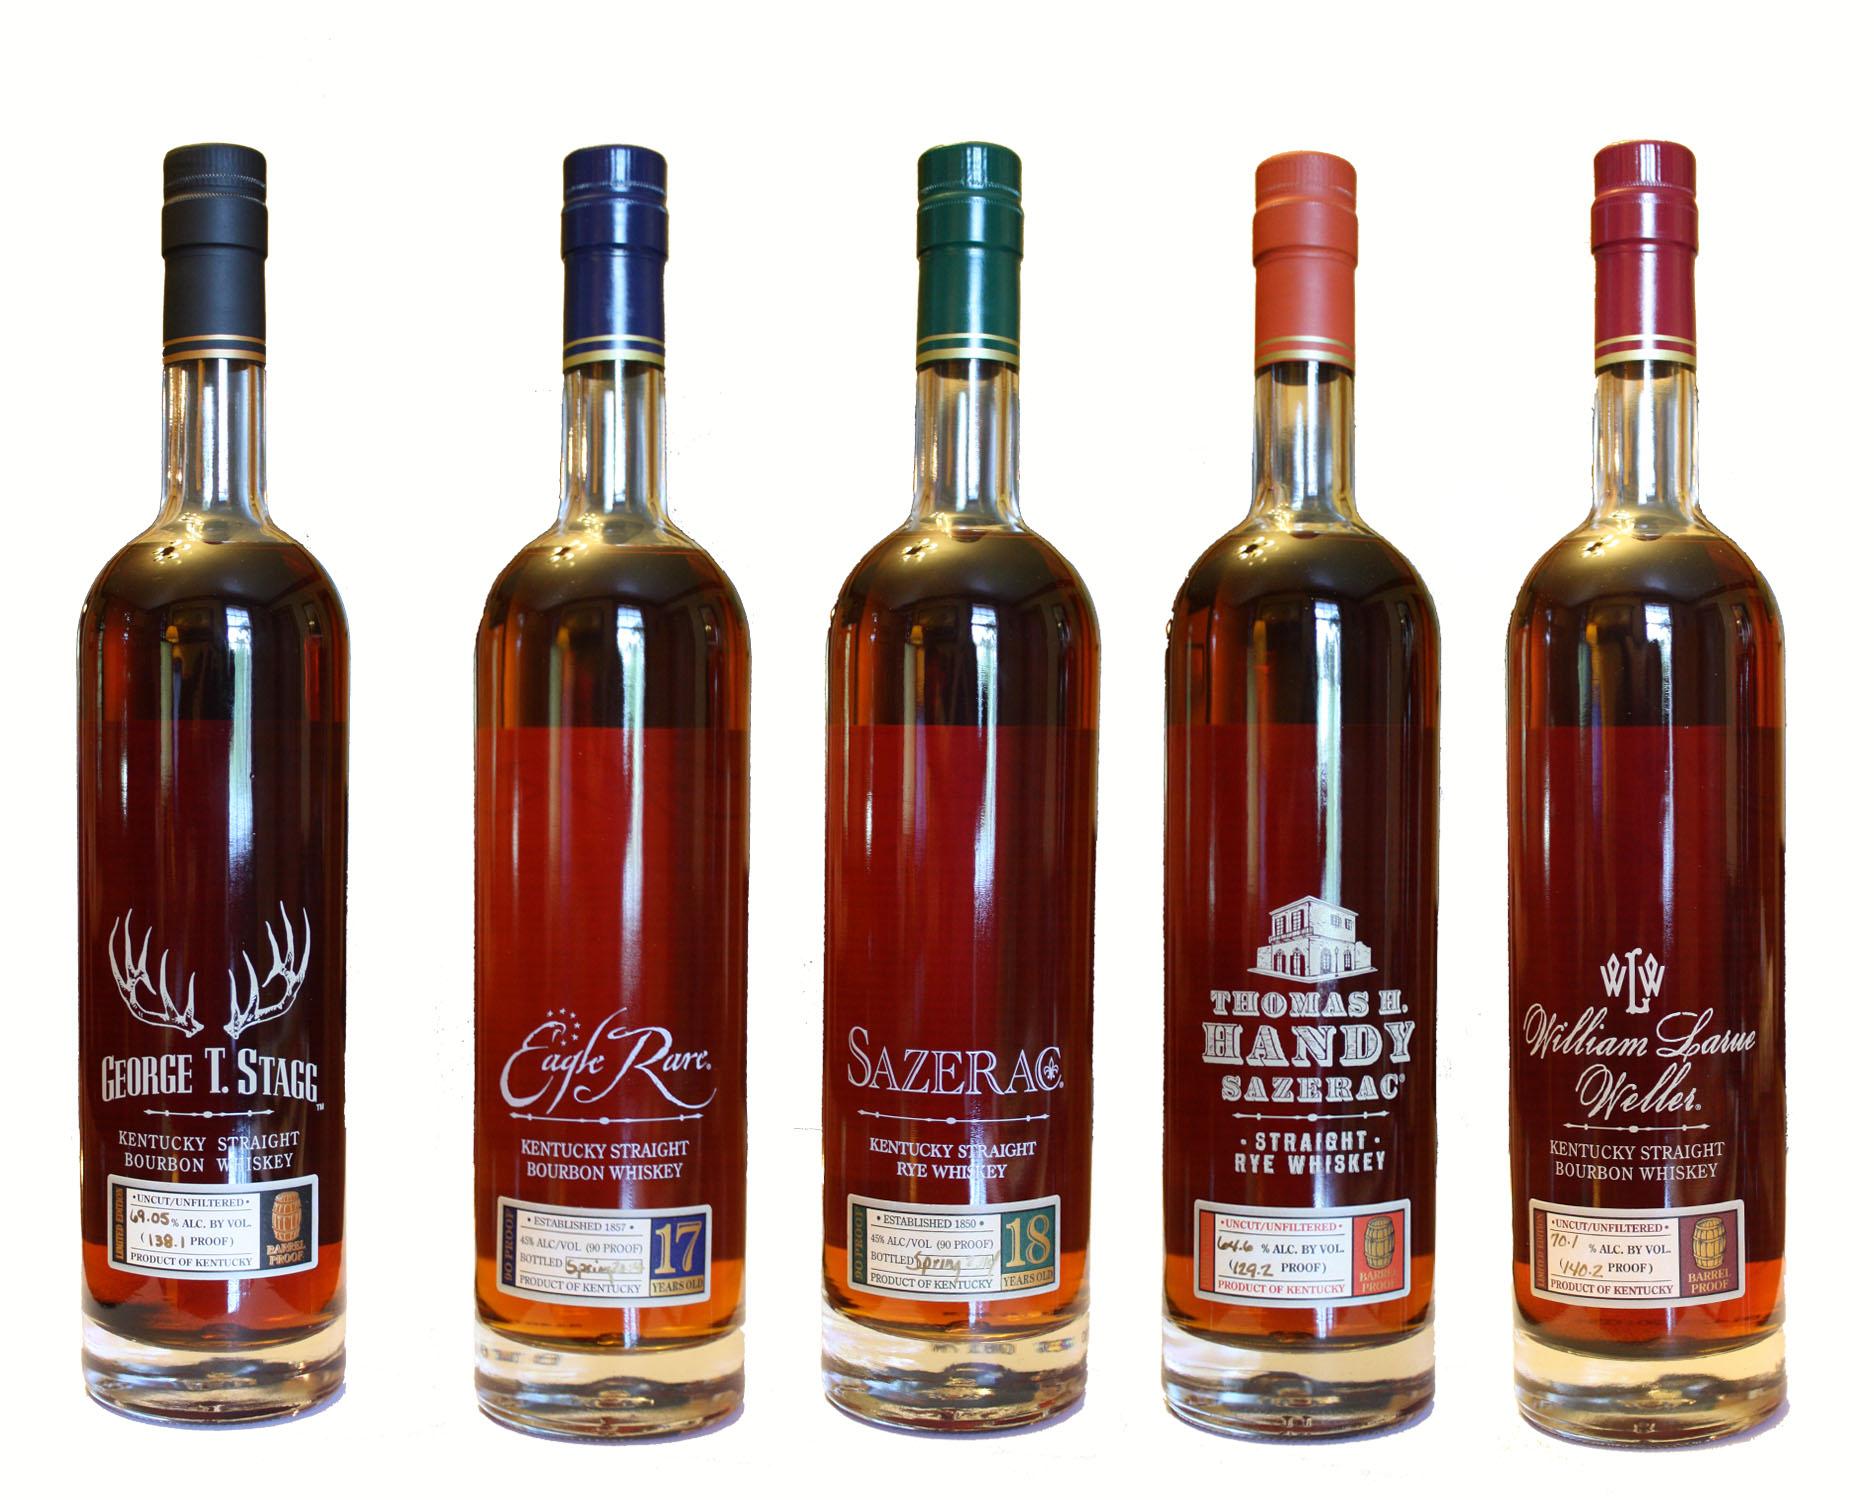 William Larue Weller Bourbon 2014